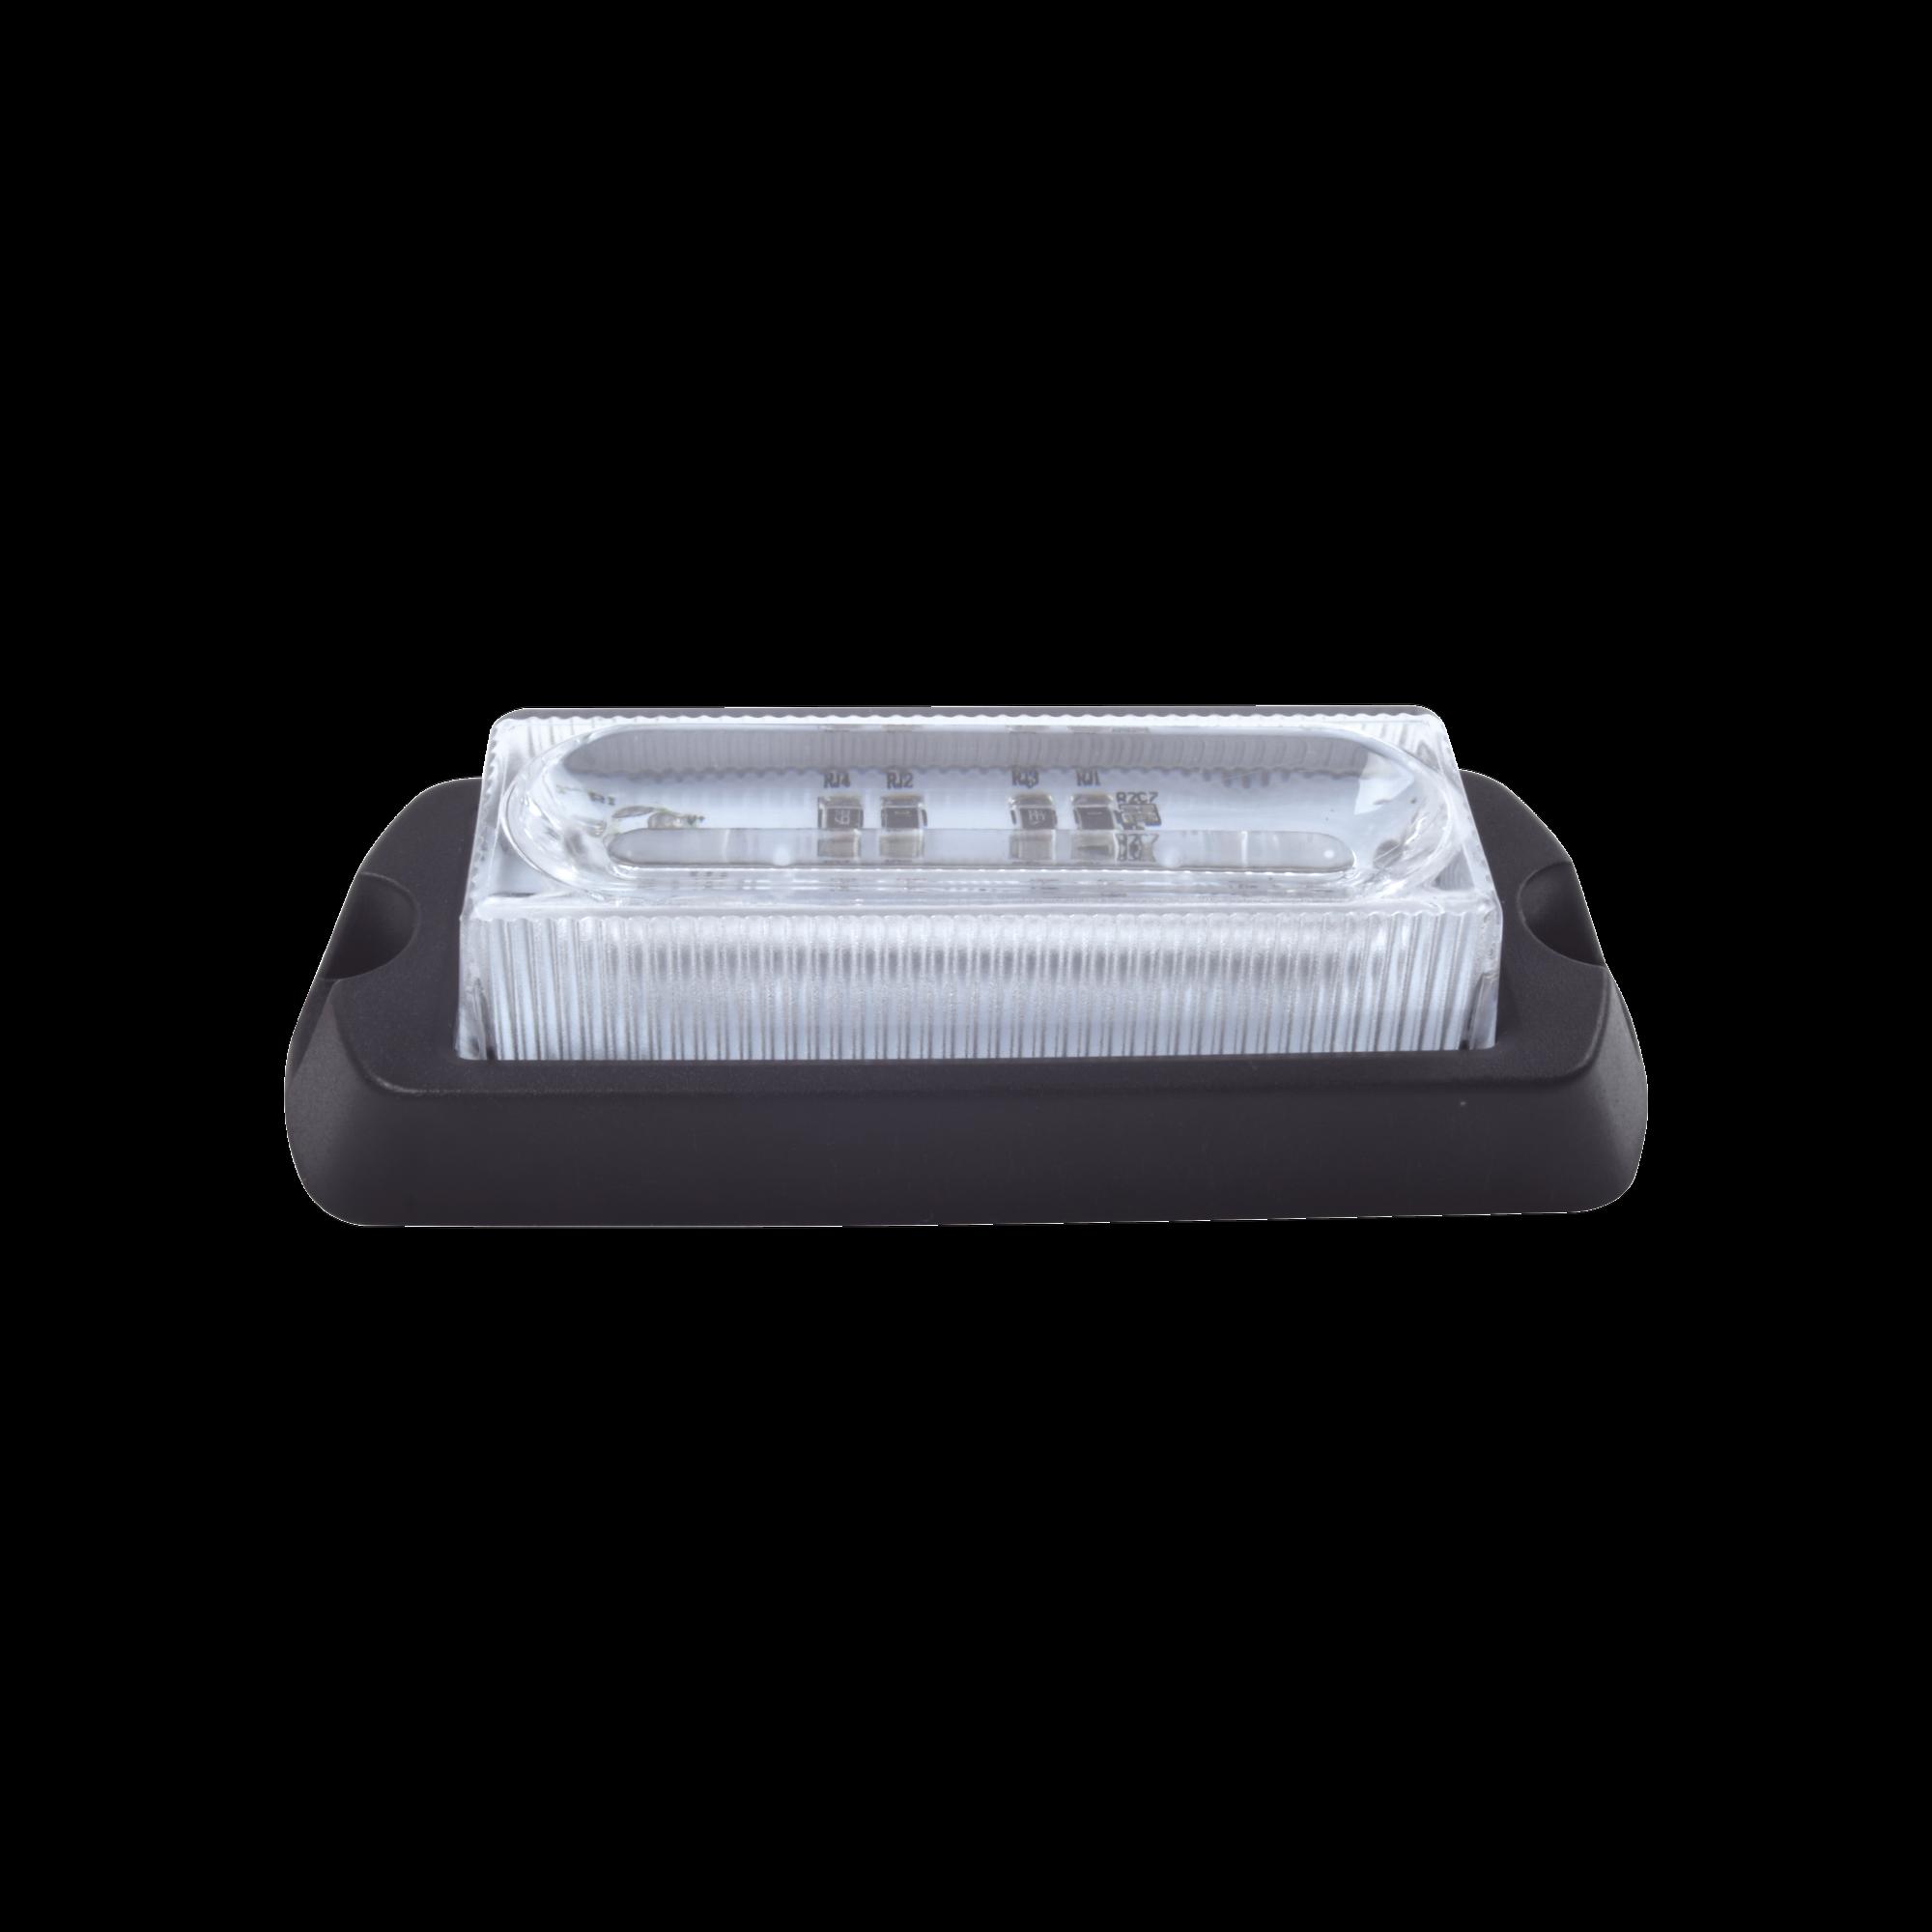 Luz Auxiliar Ultra Brillante X13 de 4 LEDs, color Rojo, con mica transparente.